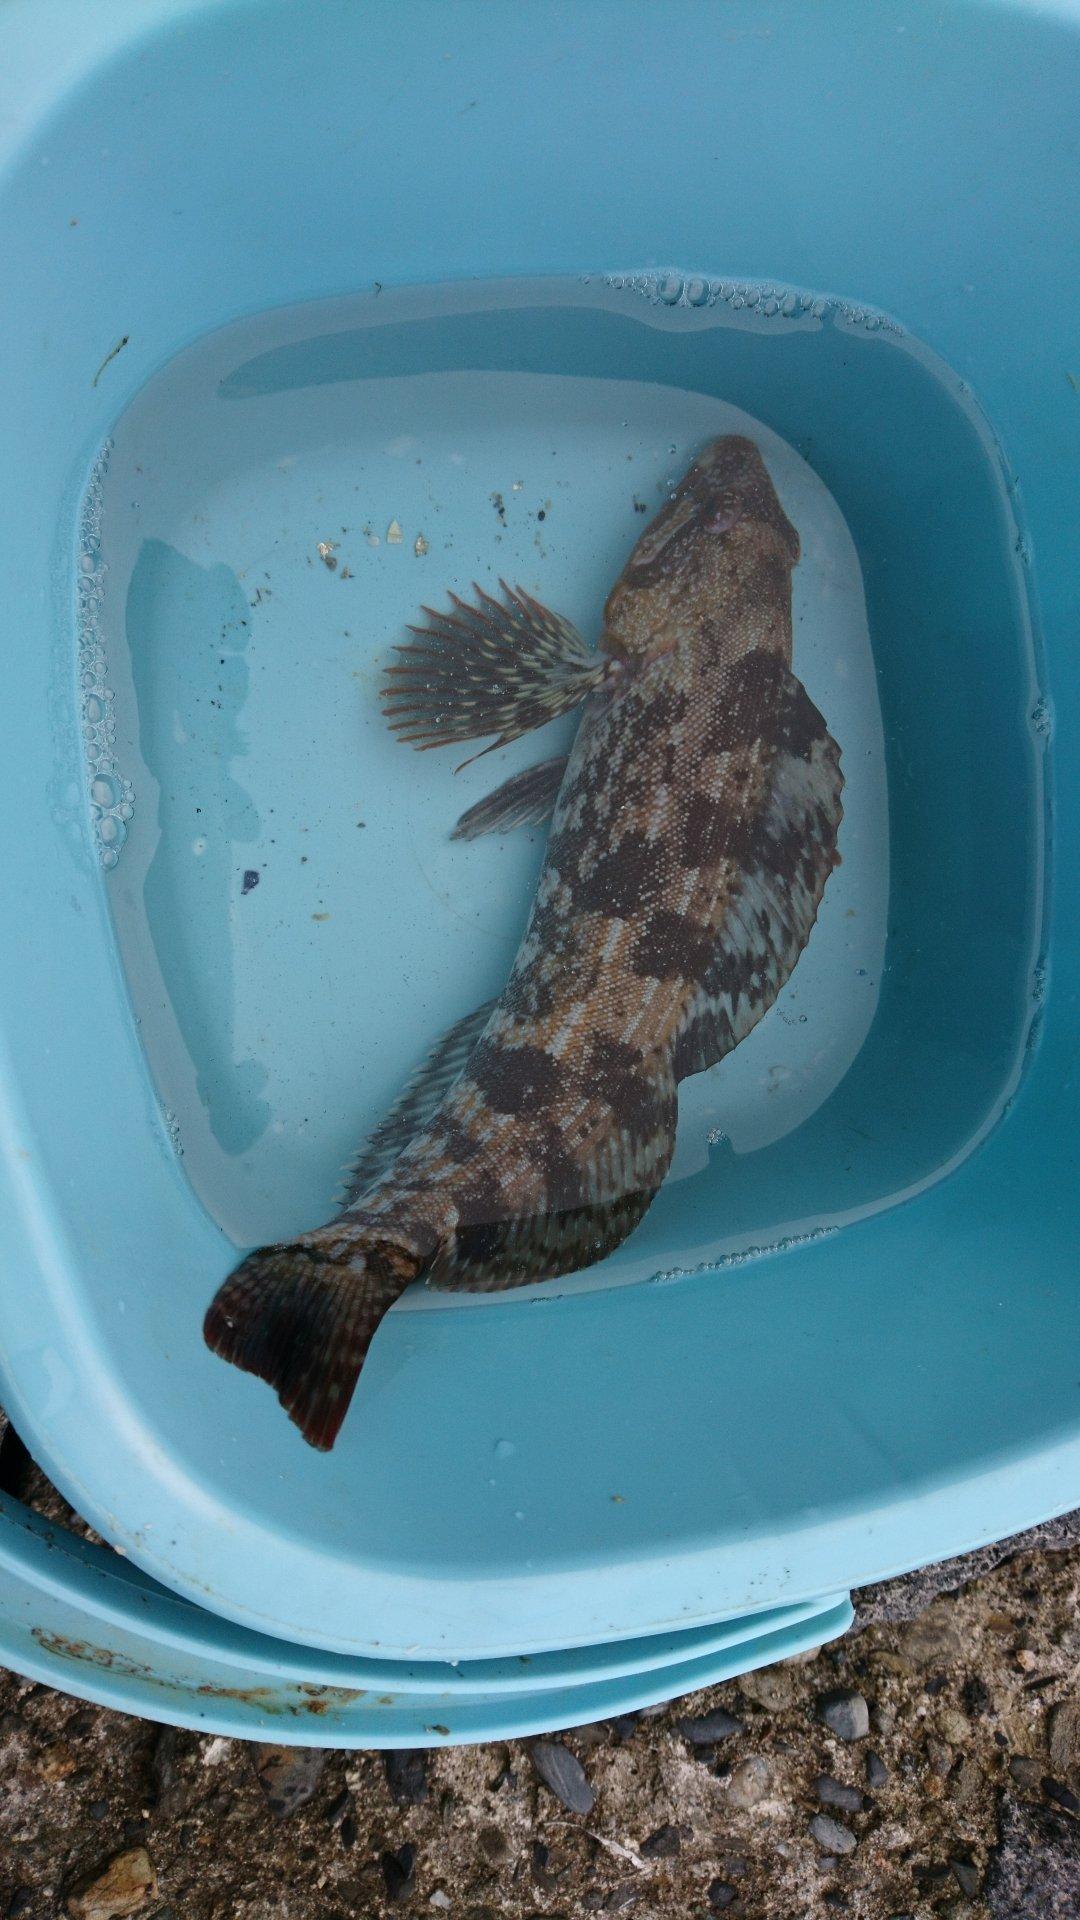 kamesukeさんの投稿画像,写っている魚はアイナメ